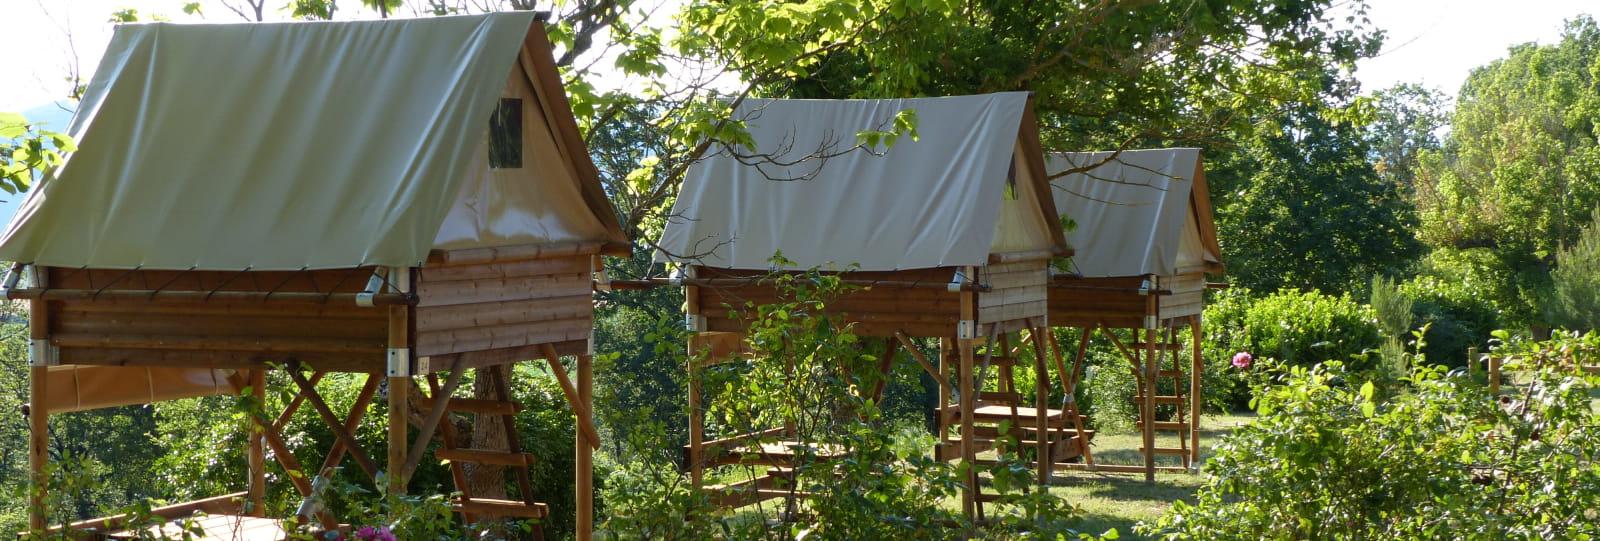 Camping du Domaine de Senaud